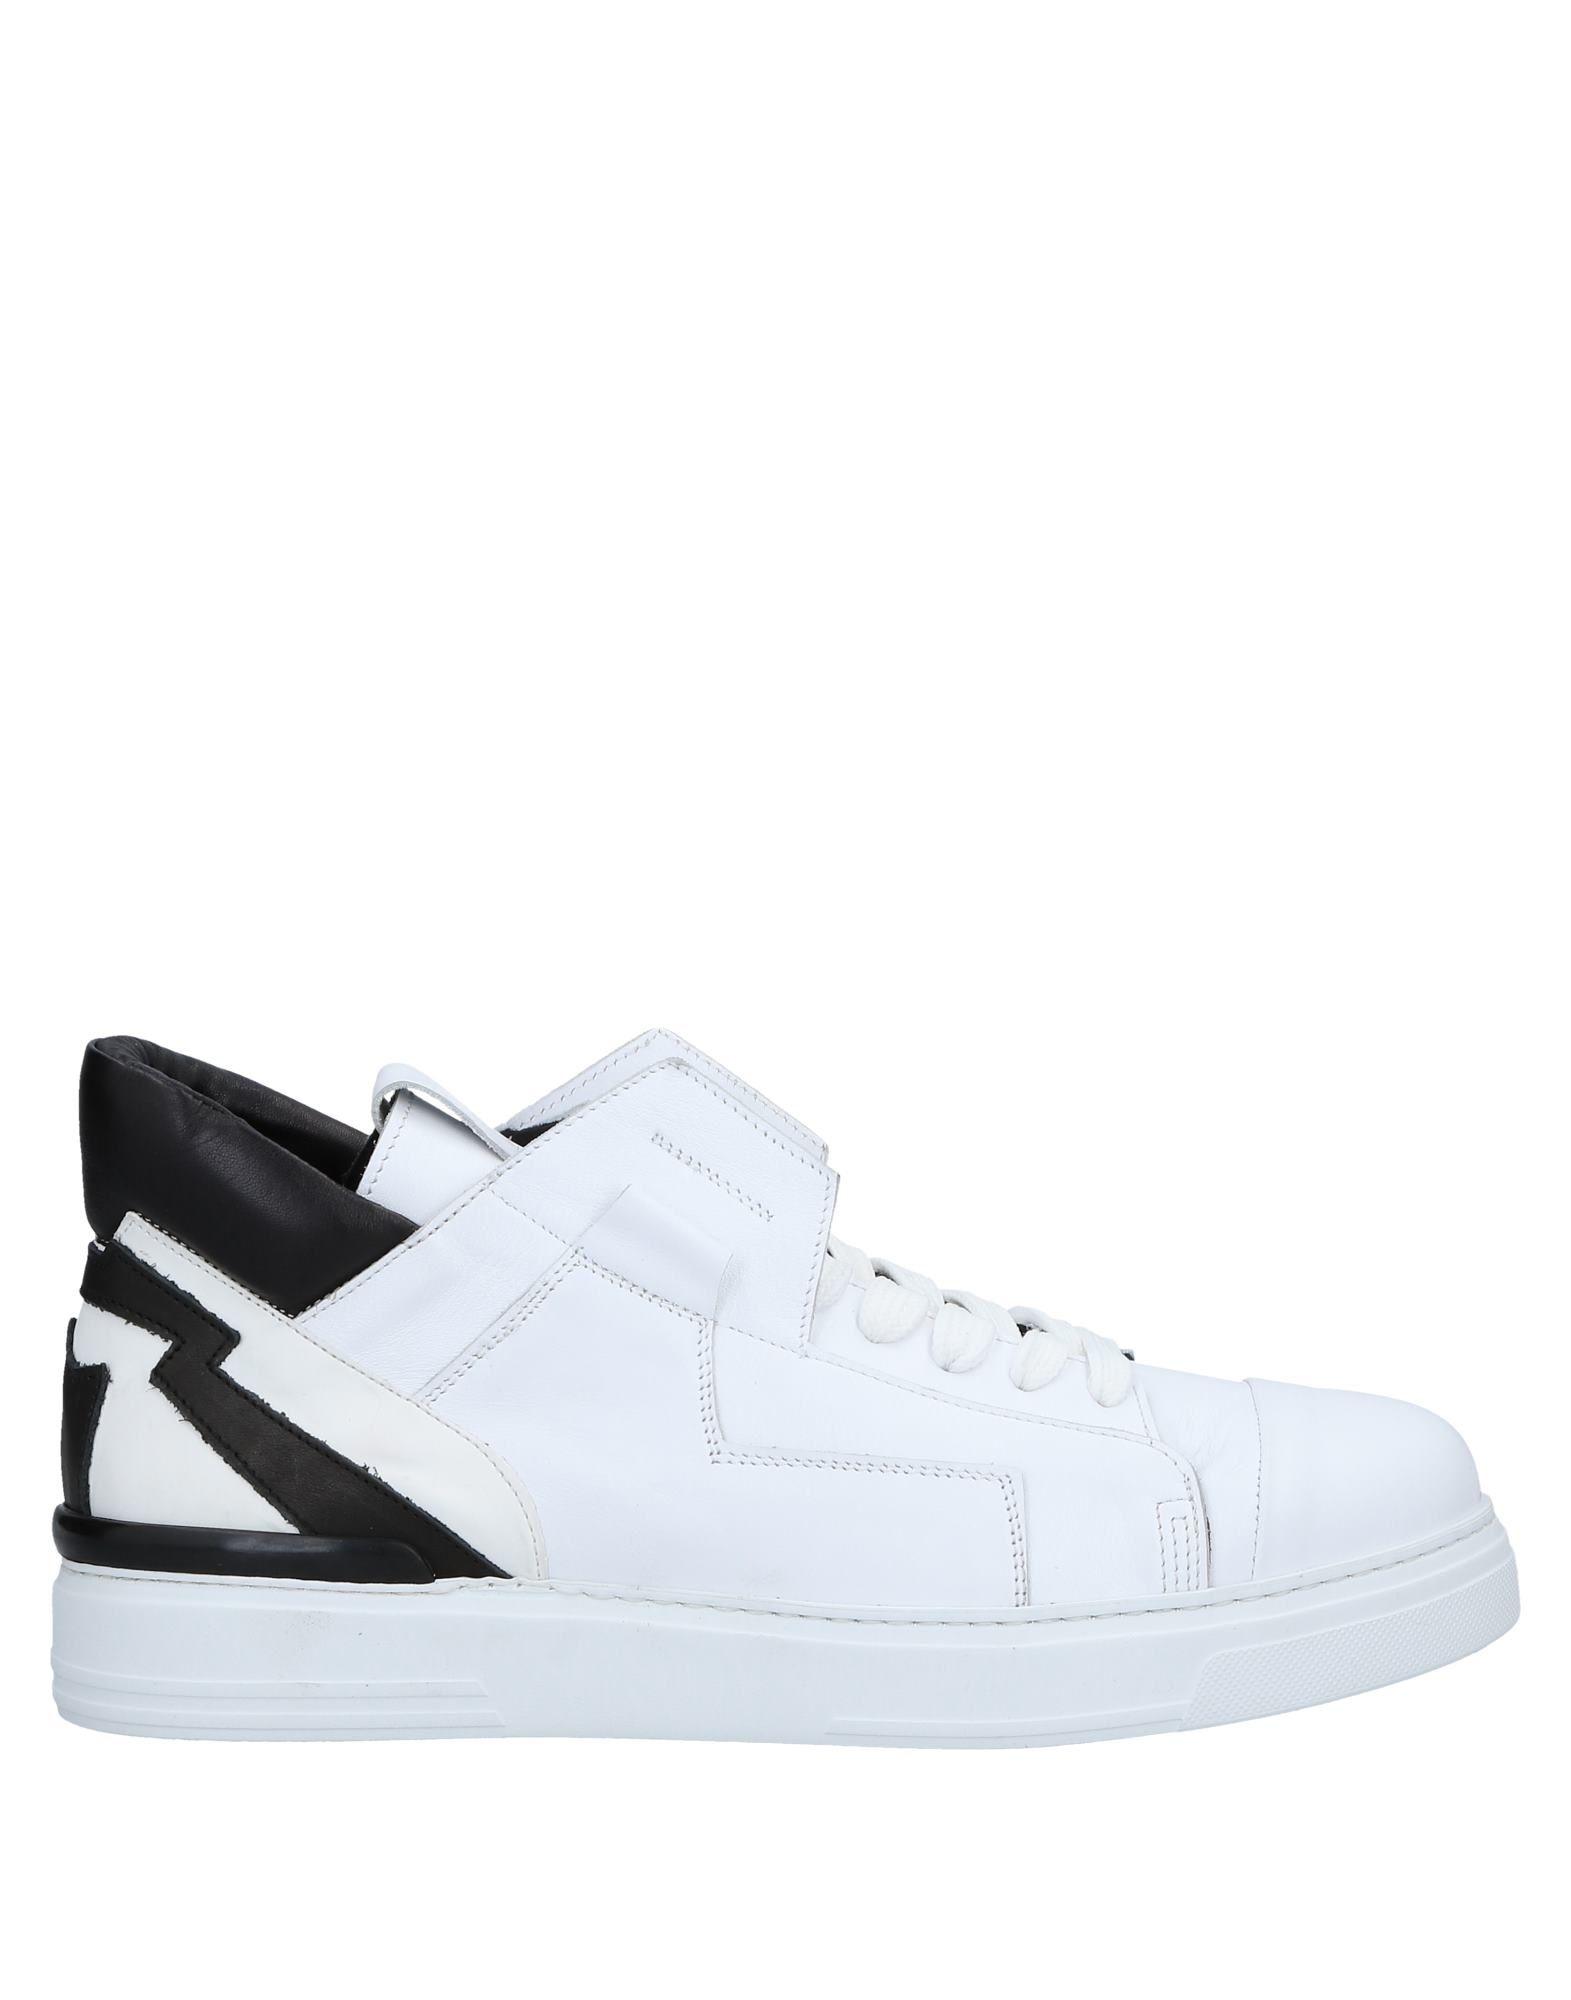 Rabatt echte Schuhe Savio Barbato Sneakers Herren  11535473NC